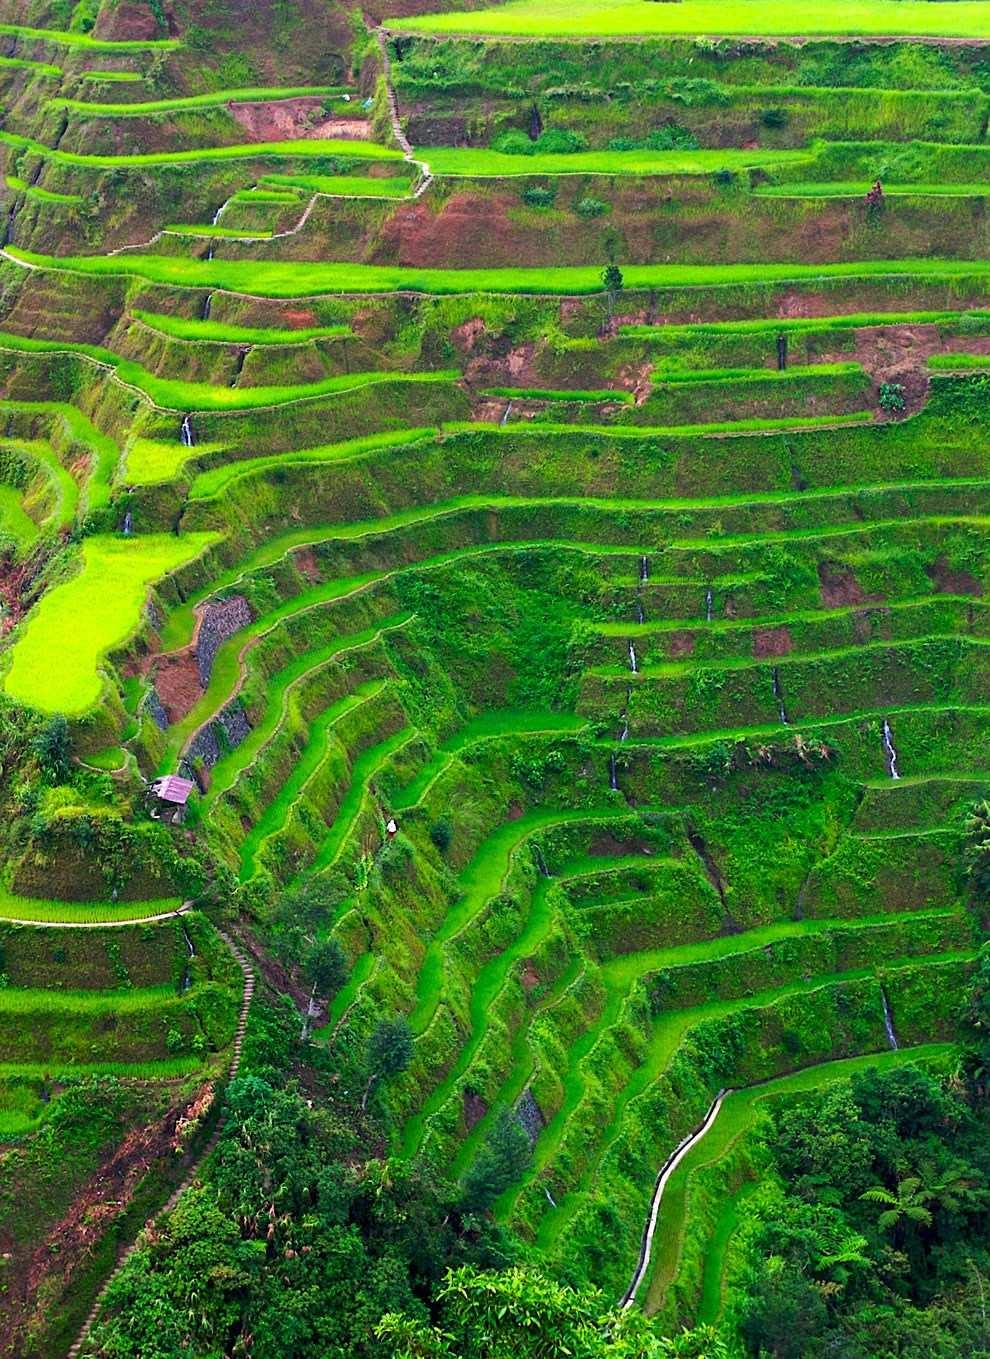 Pemandangan Sawah Hd : pemandangan, sawah, Pemandangan, Sawah, Terdahsyat, Dunia, Banaue, Terraces, (#594511), Wallpaper, Backgrounds, Download